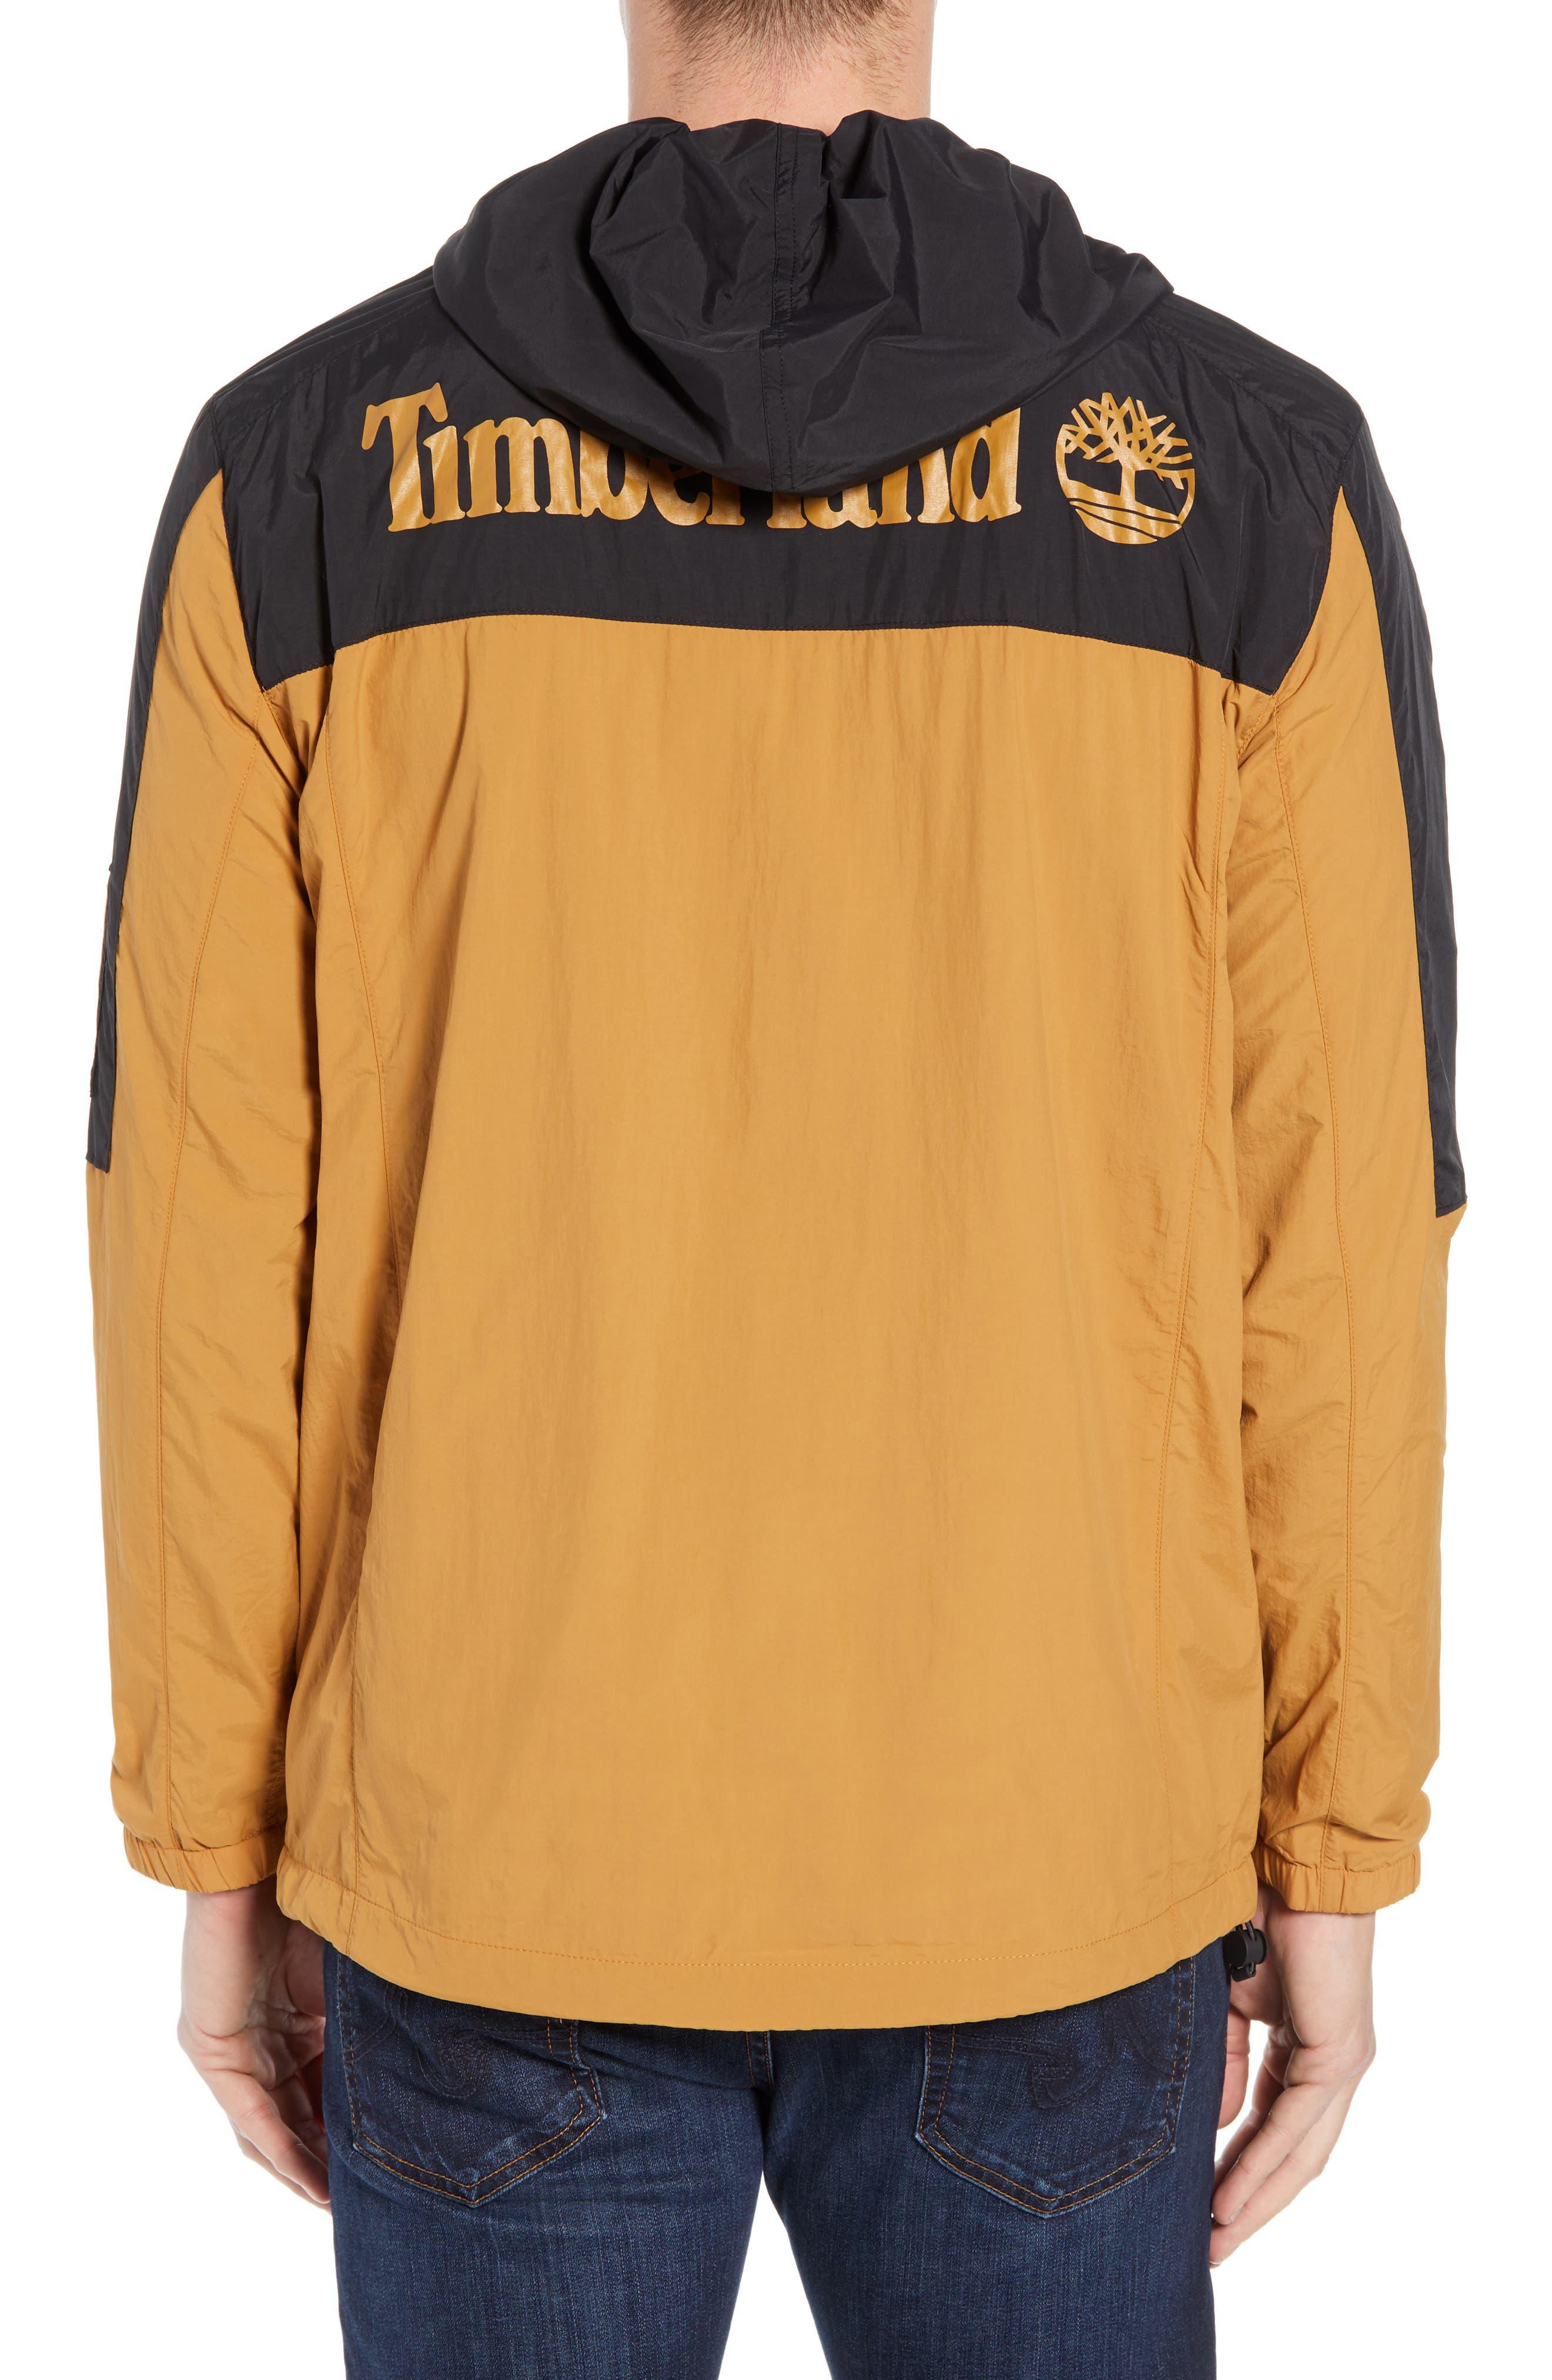 Windbreaker Hooded Jacket,                             Alternate thumbnail 2, color,                             WHEAT BOOT/ BLACK